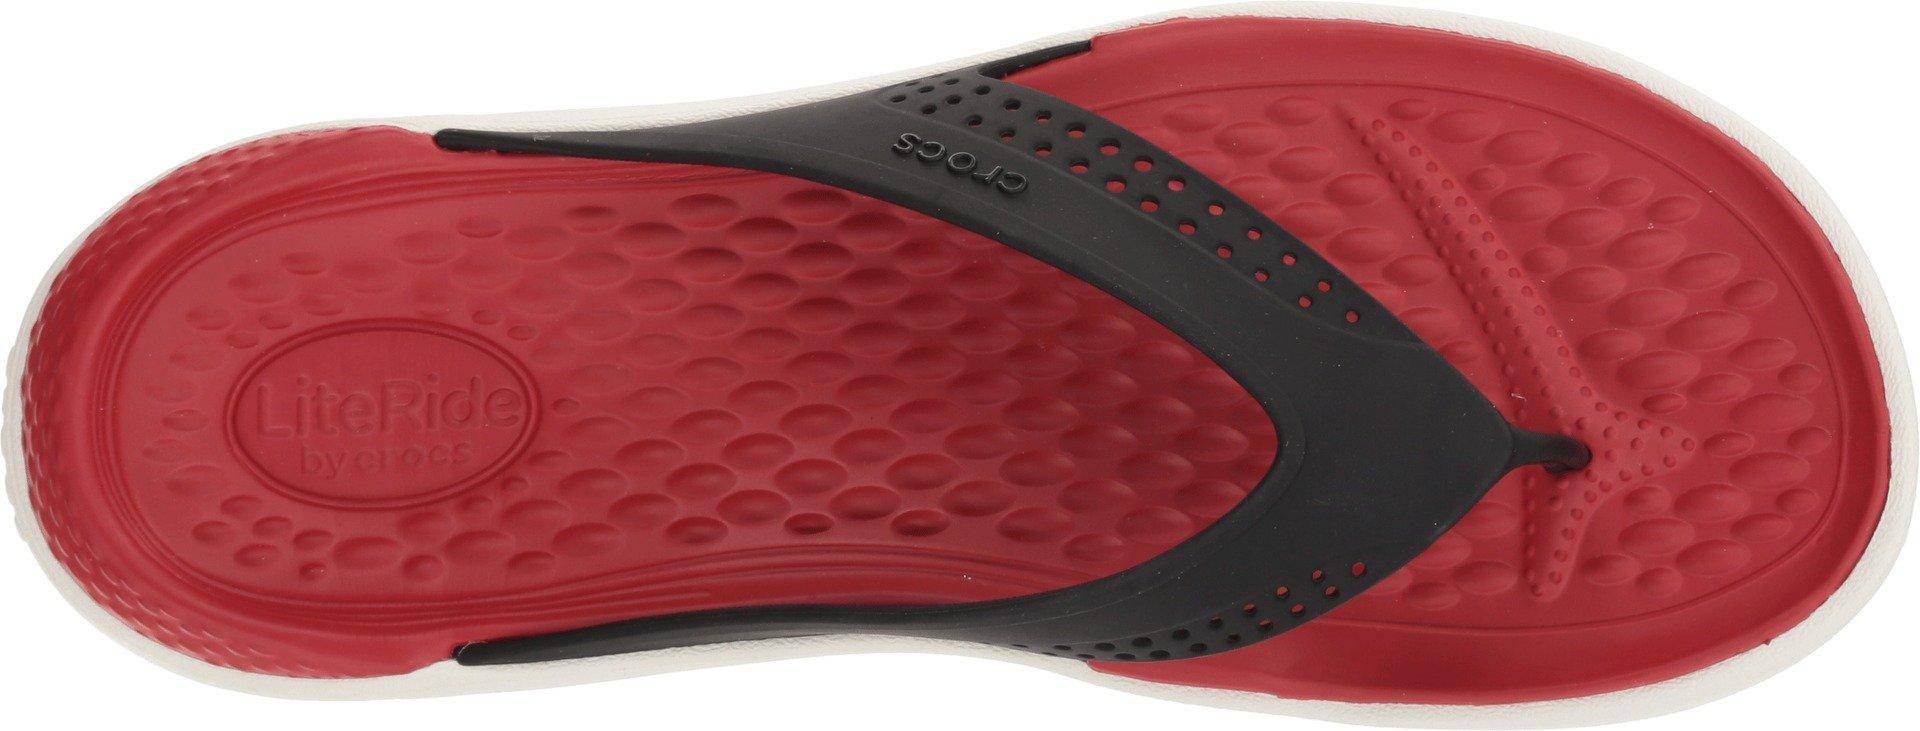 7a1b509c273c19 Crocs Unisex LiteRide Flip